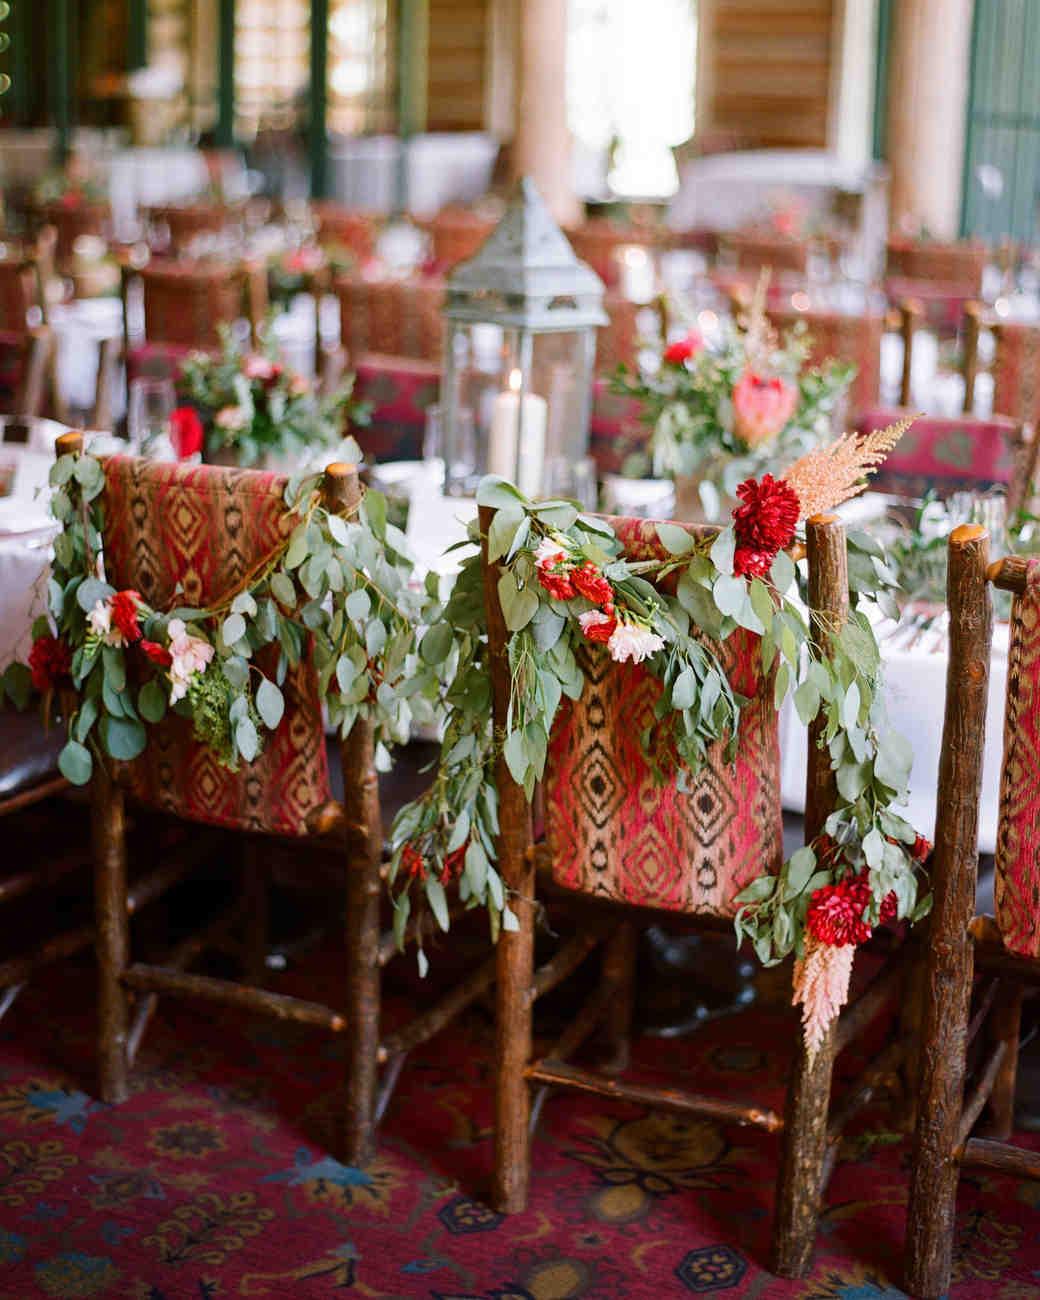 stacey-eric-wedding-reception-14-s111513-1014.jpg